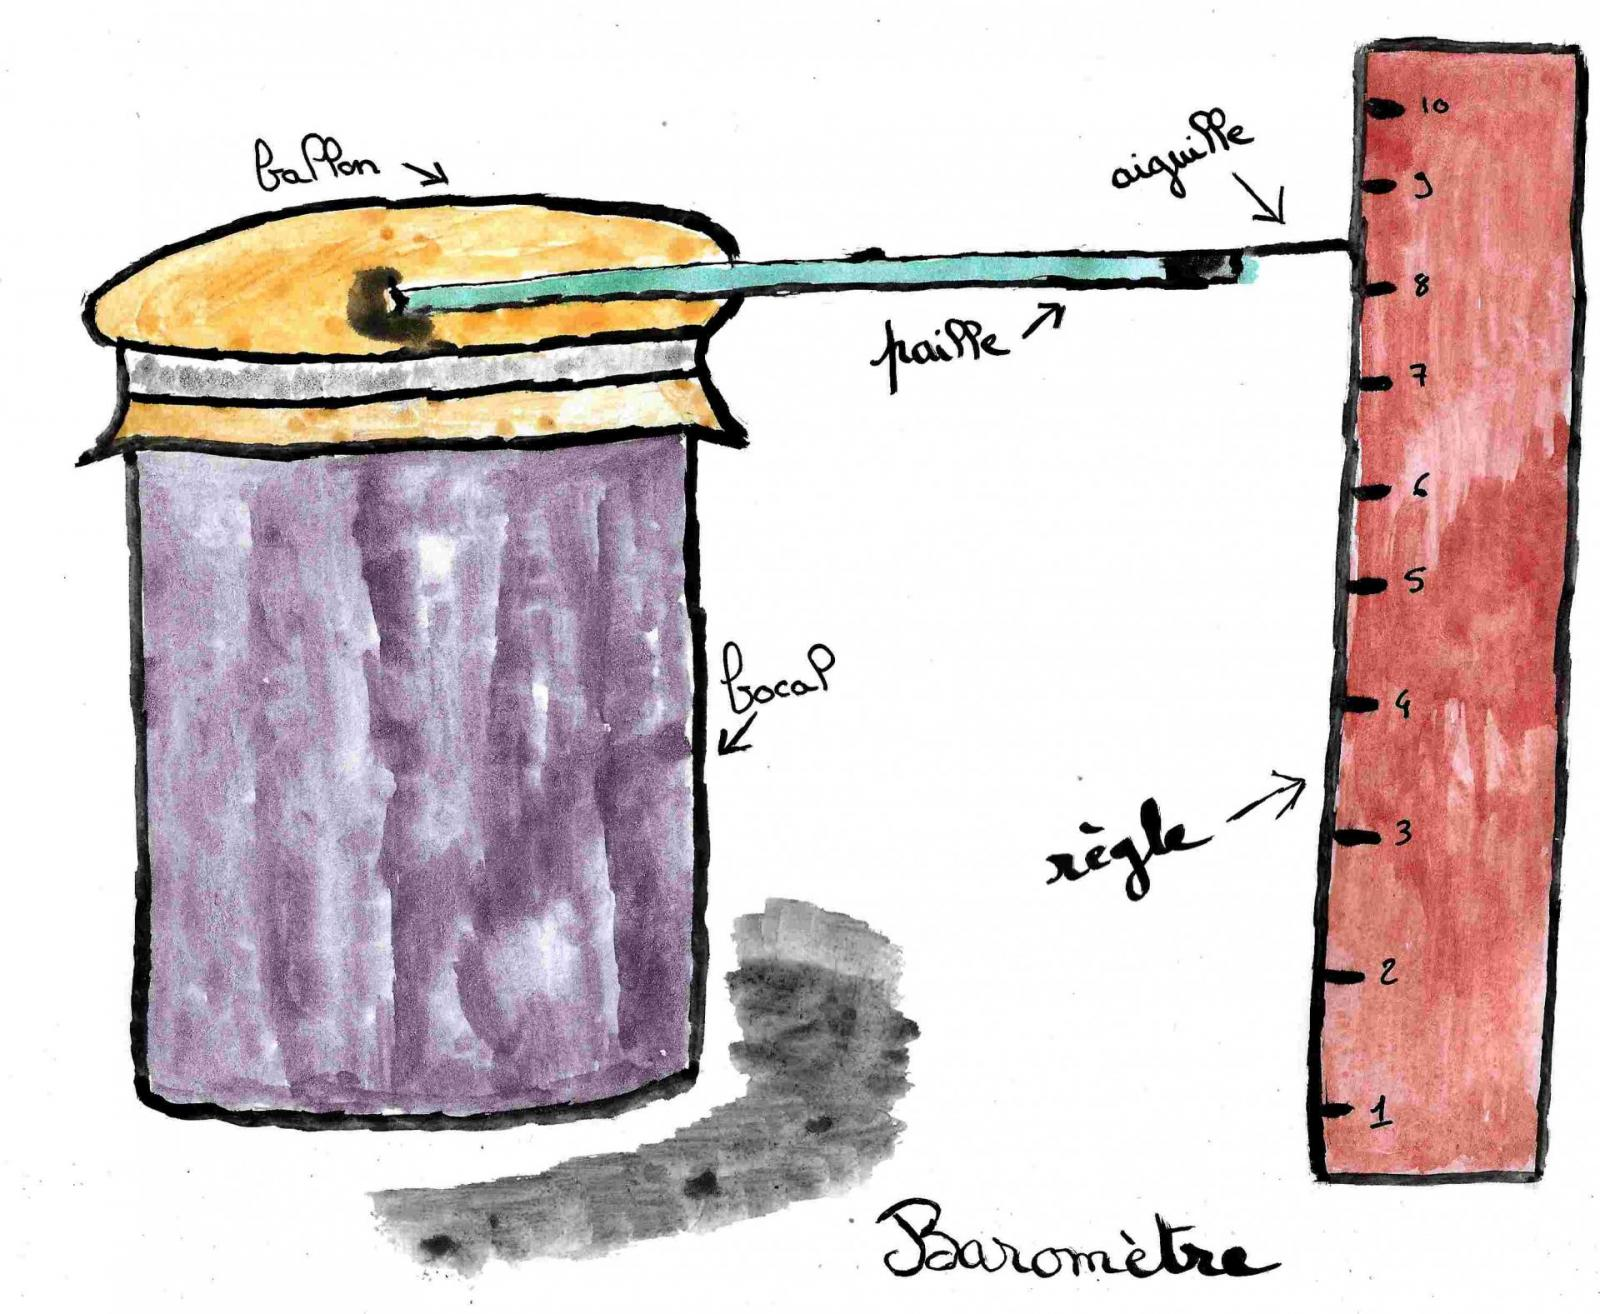 Barometre 2